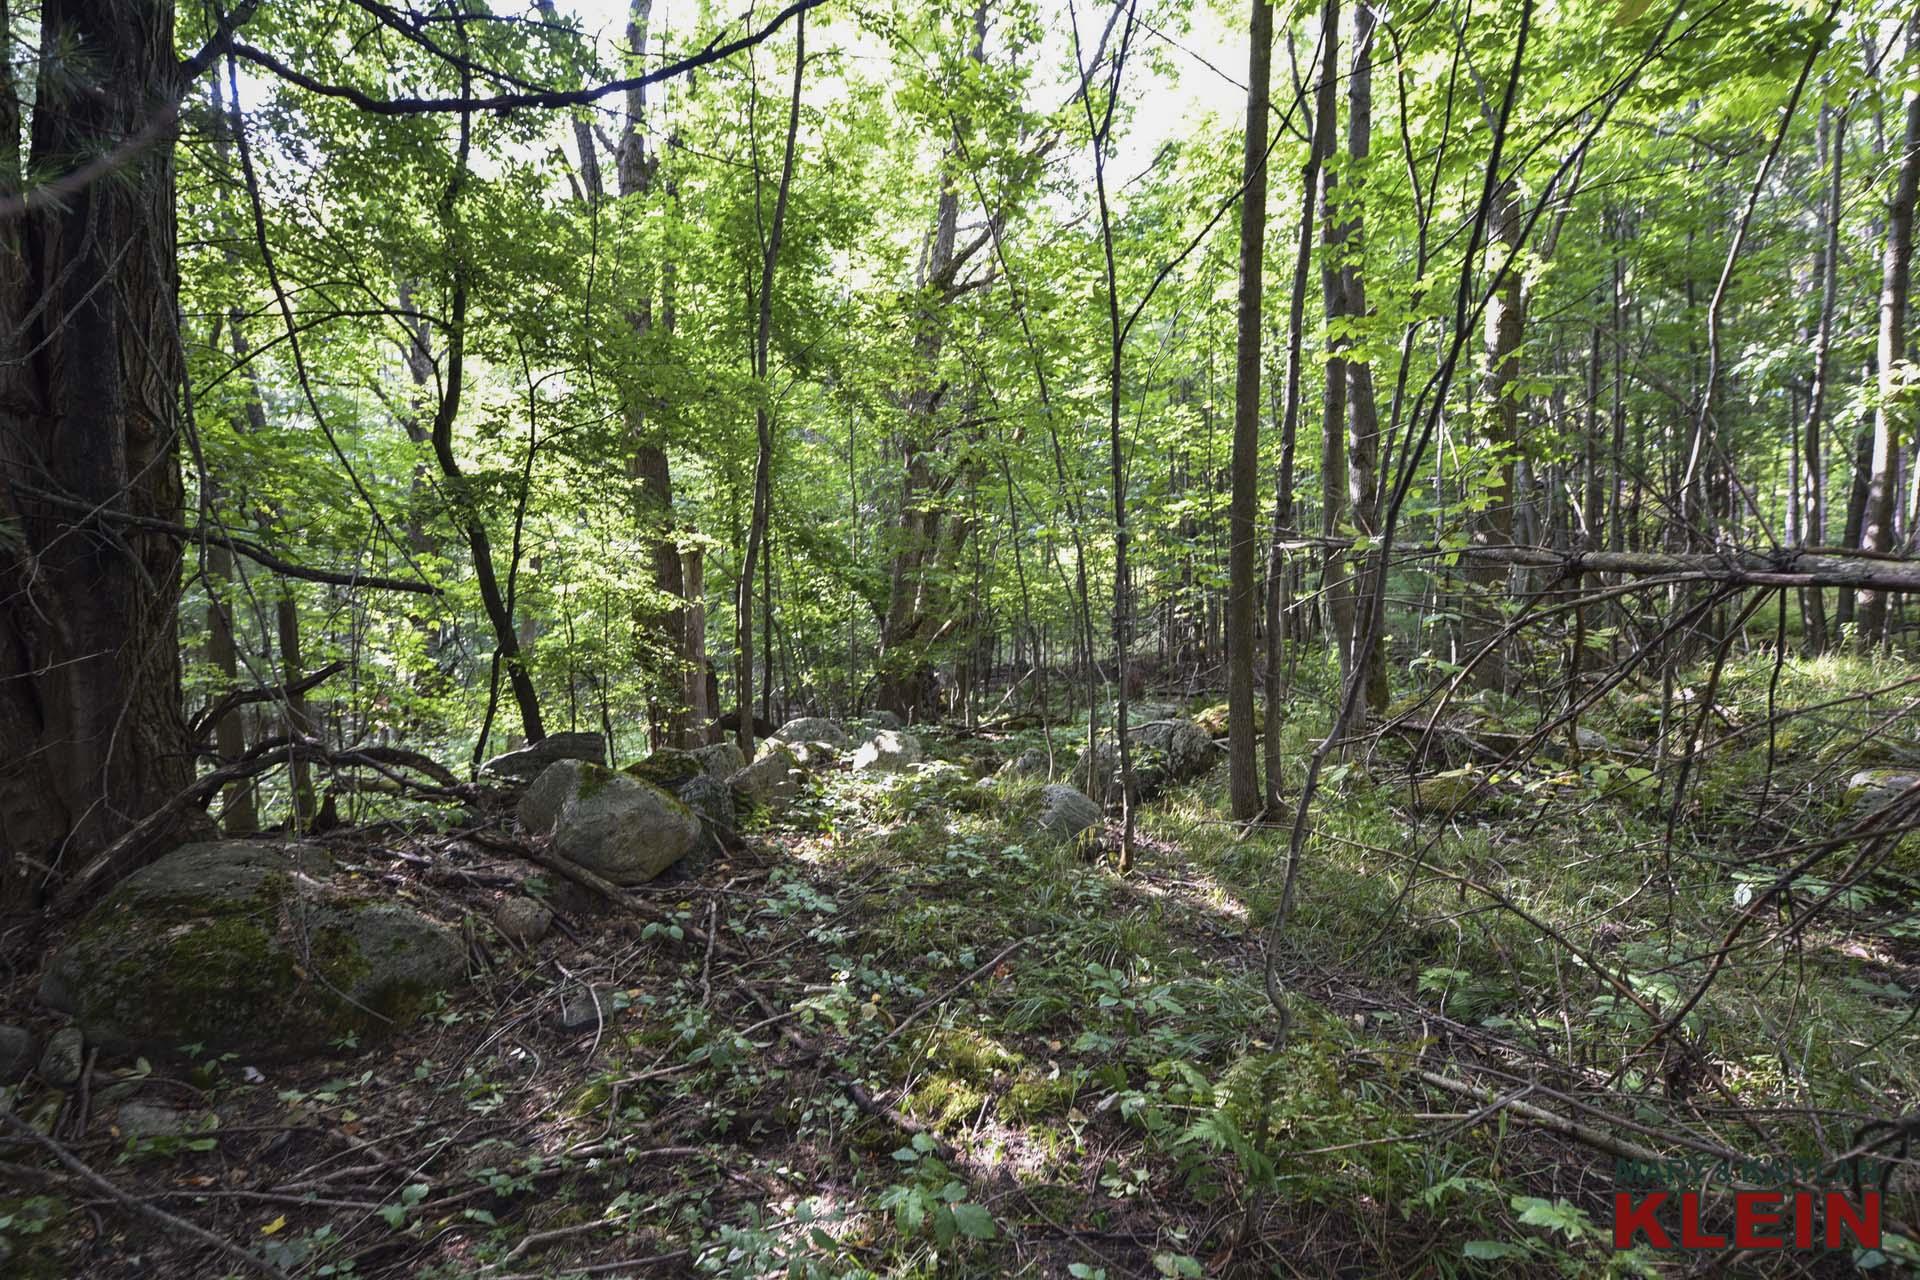 Mature Trees, trails, rocks